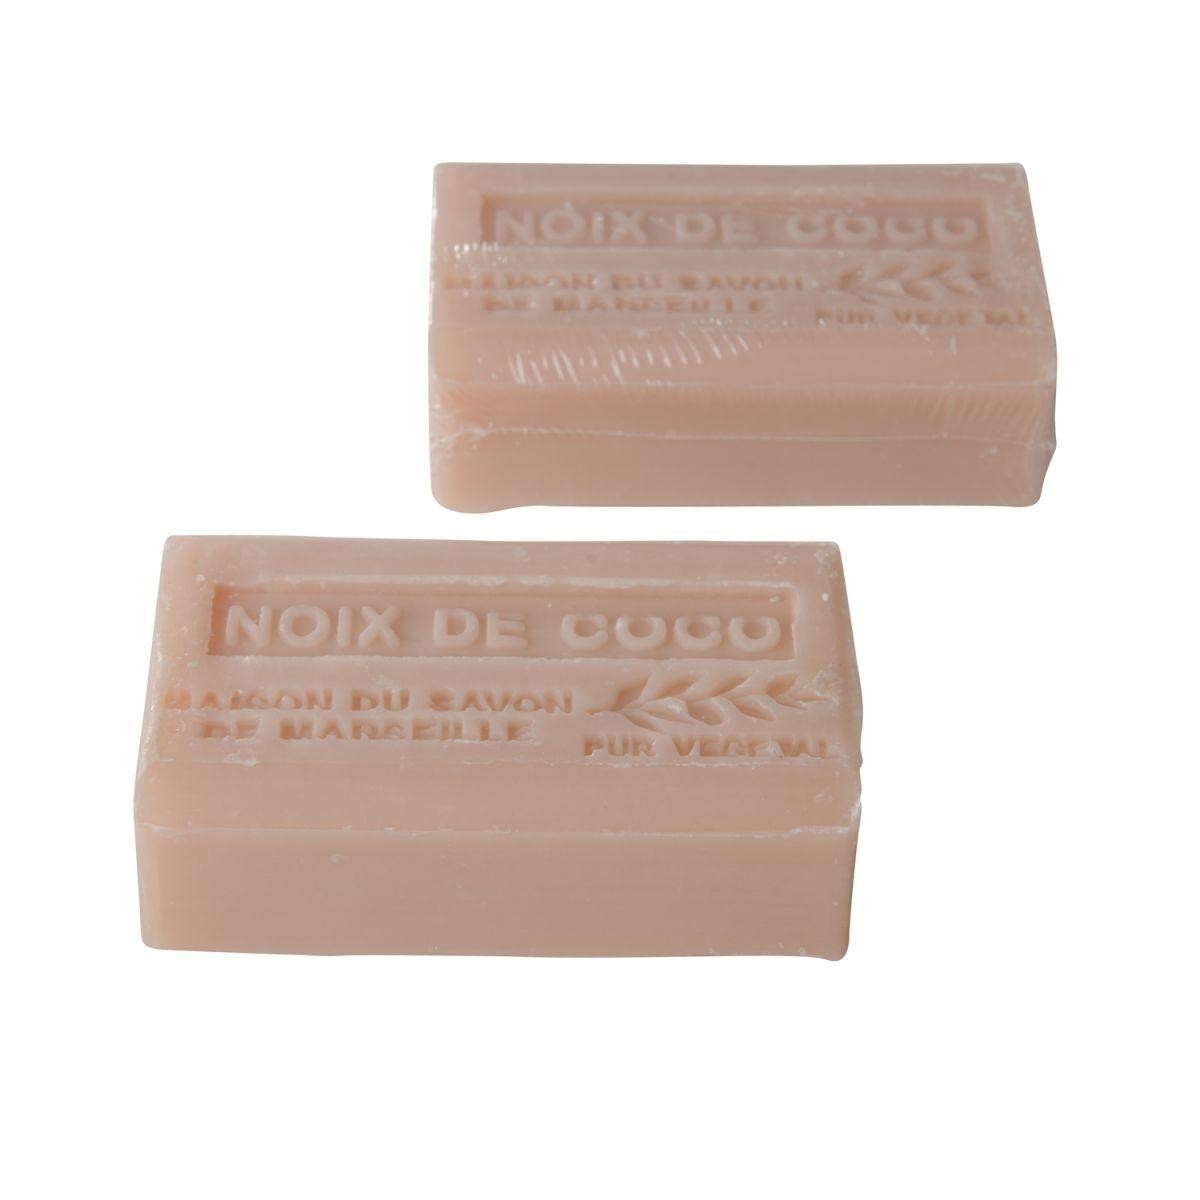 handzeep marseille 125 gr noix de coco box12